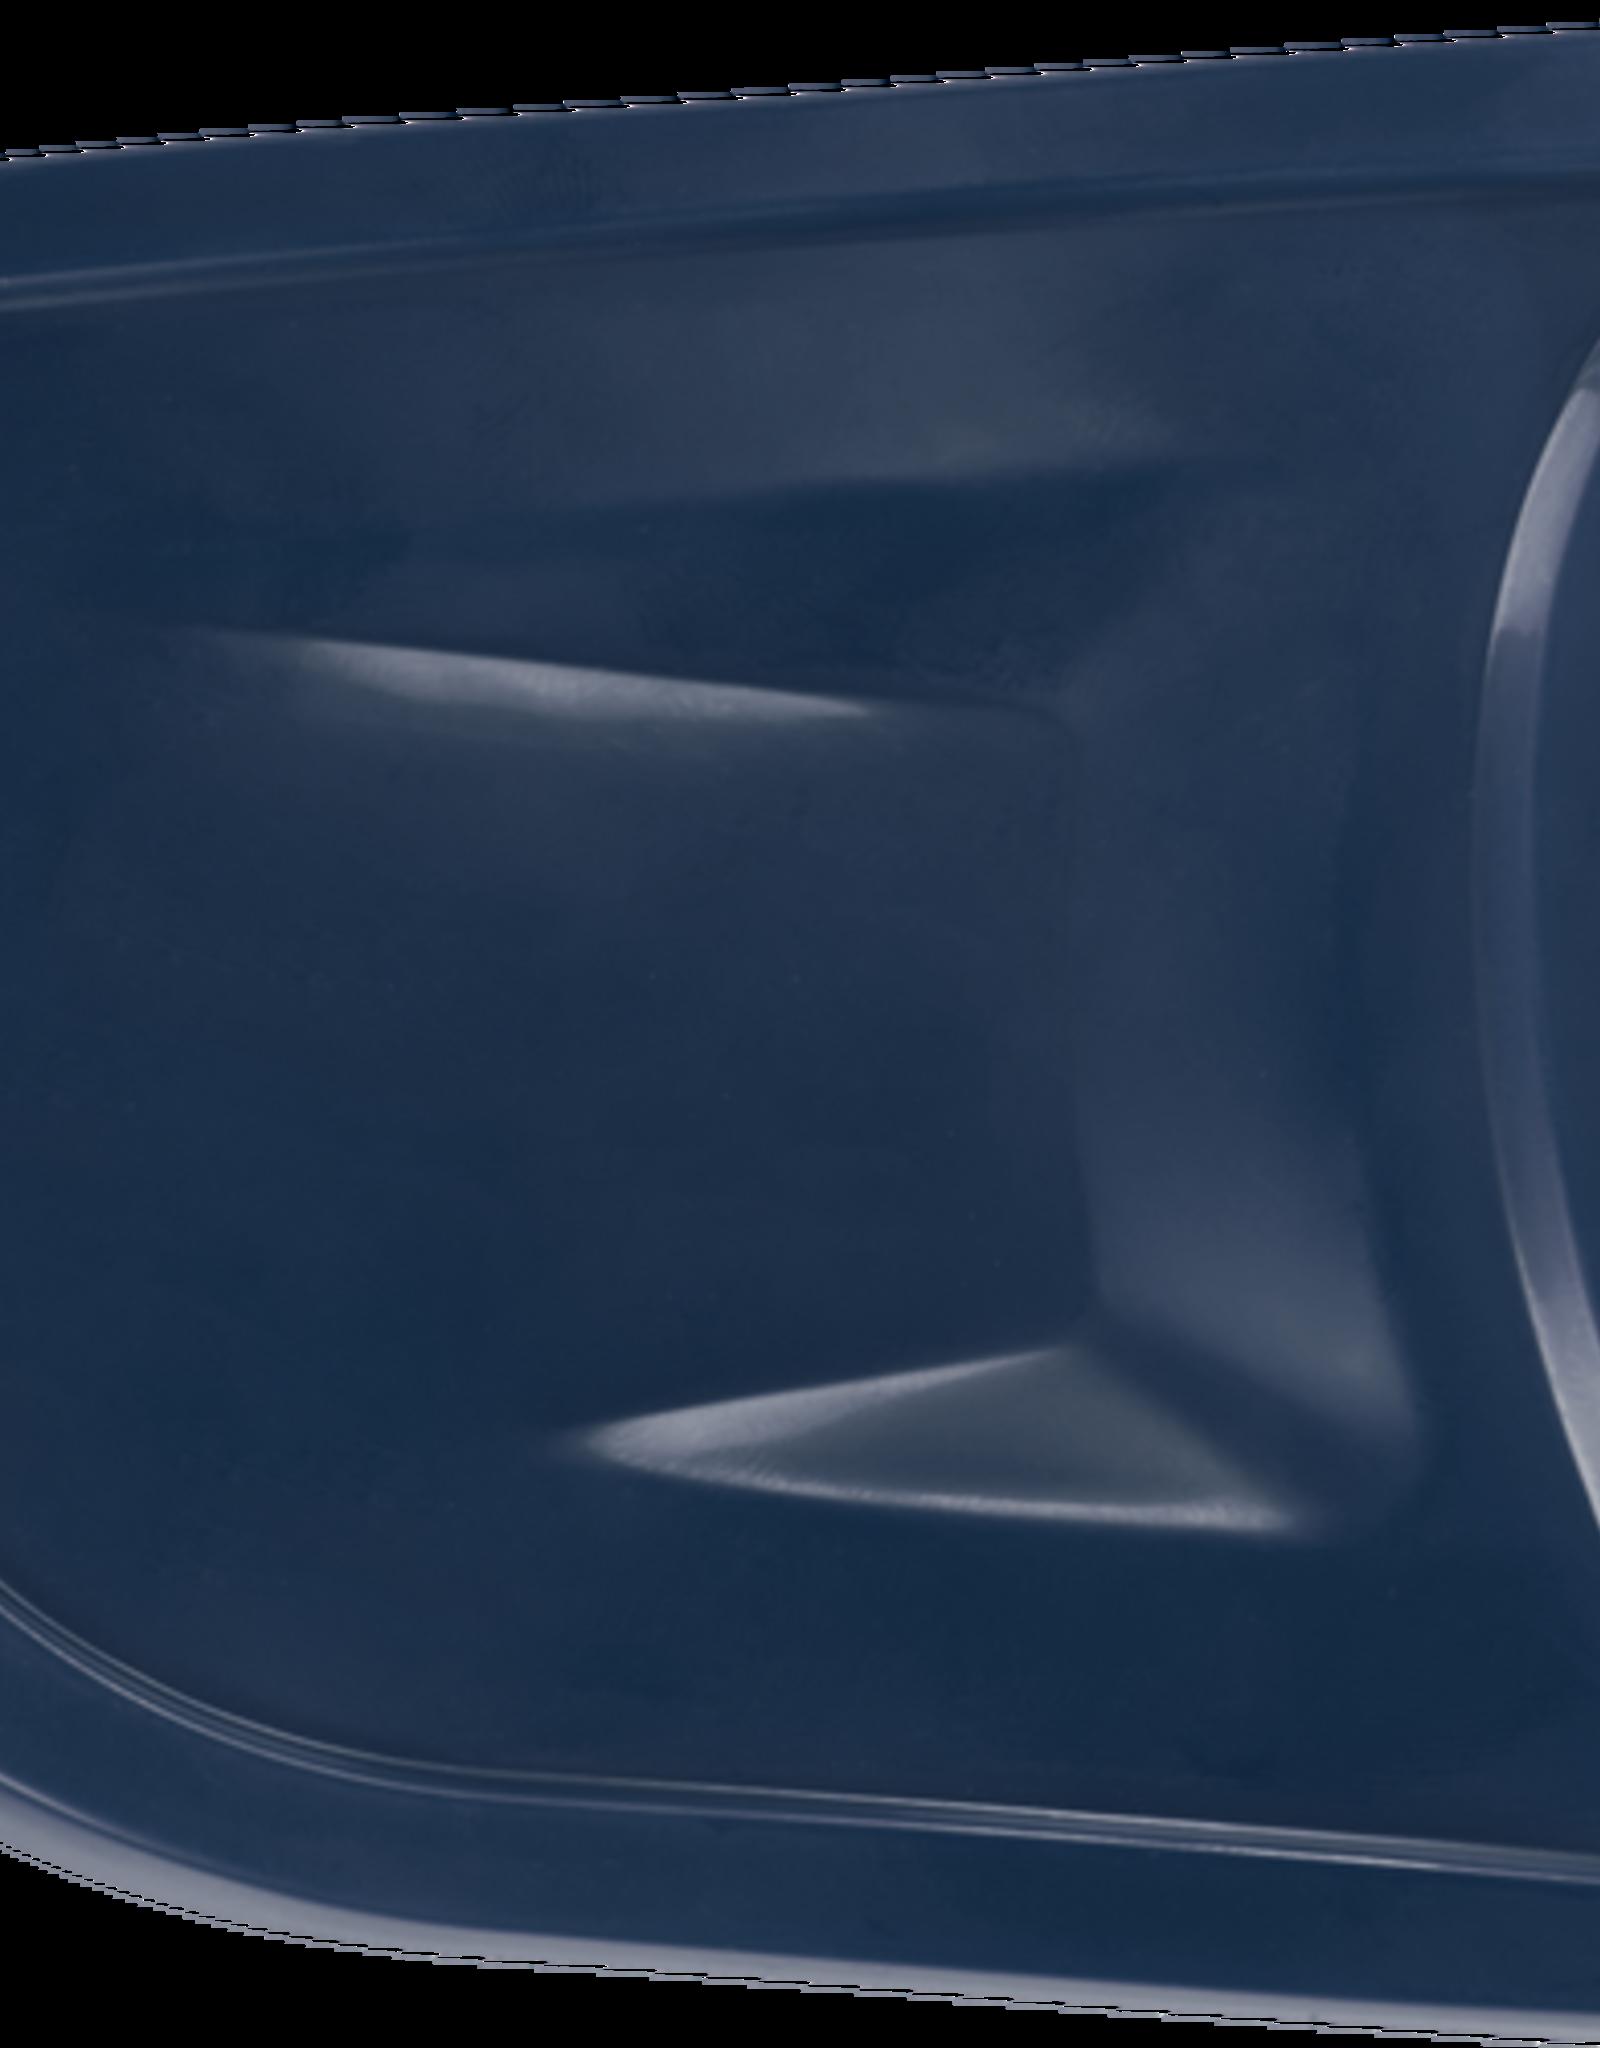 R16  Extender 1-Tone - RHB-Navy,extention de casque droite  bleu